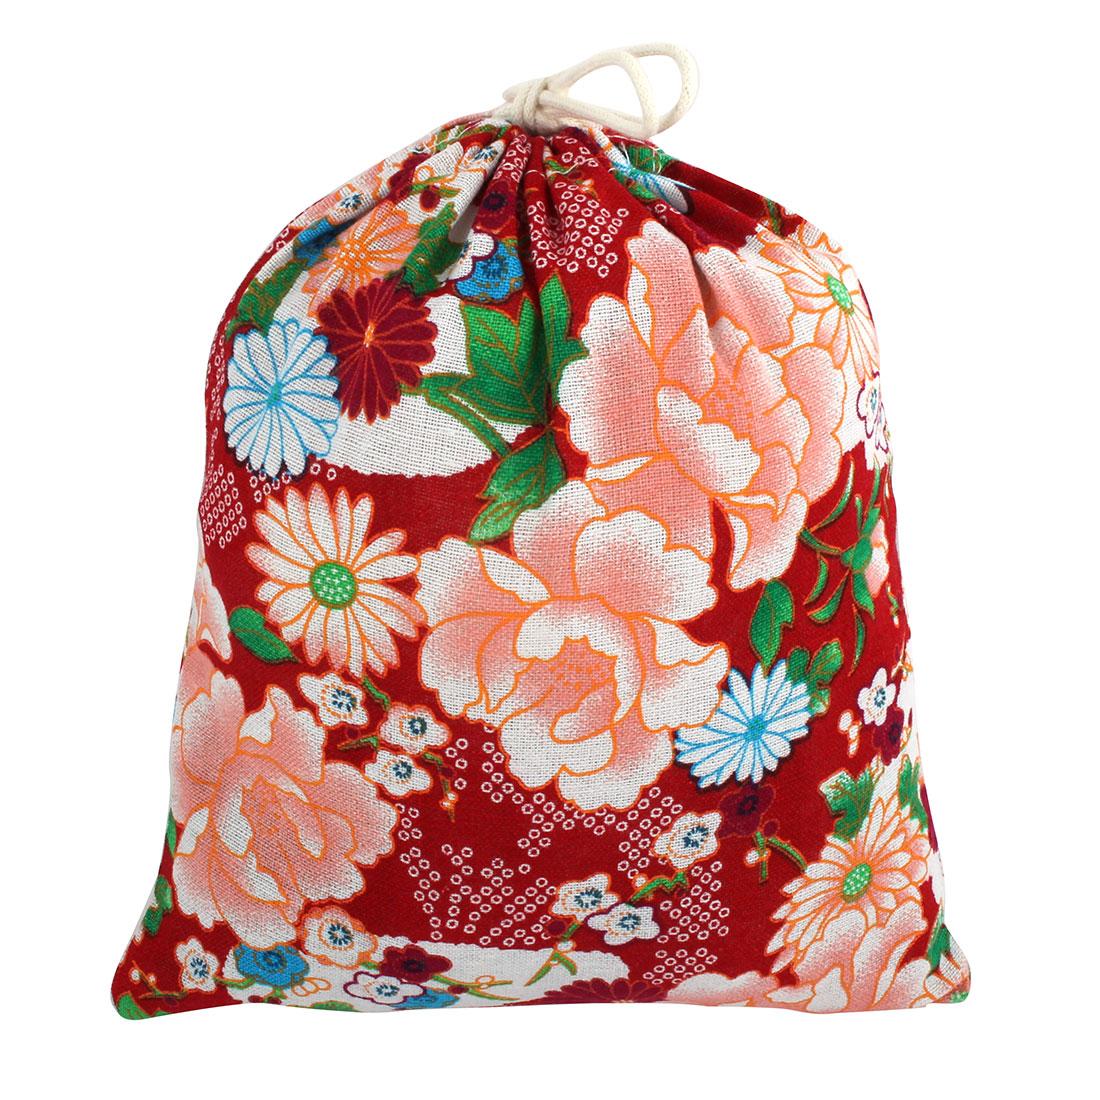 Household Cotton Linen Flower Pattern Organizer Storage Pouch Drawstring Bag Red